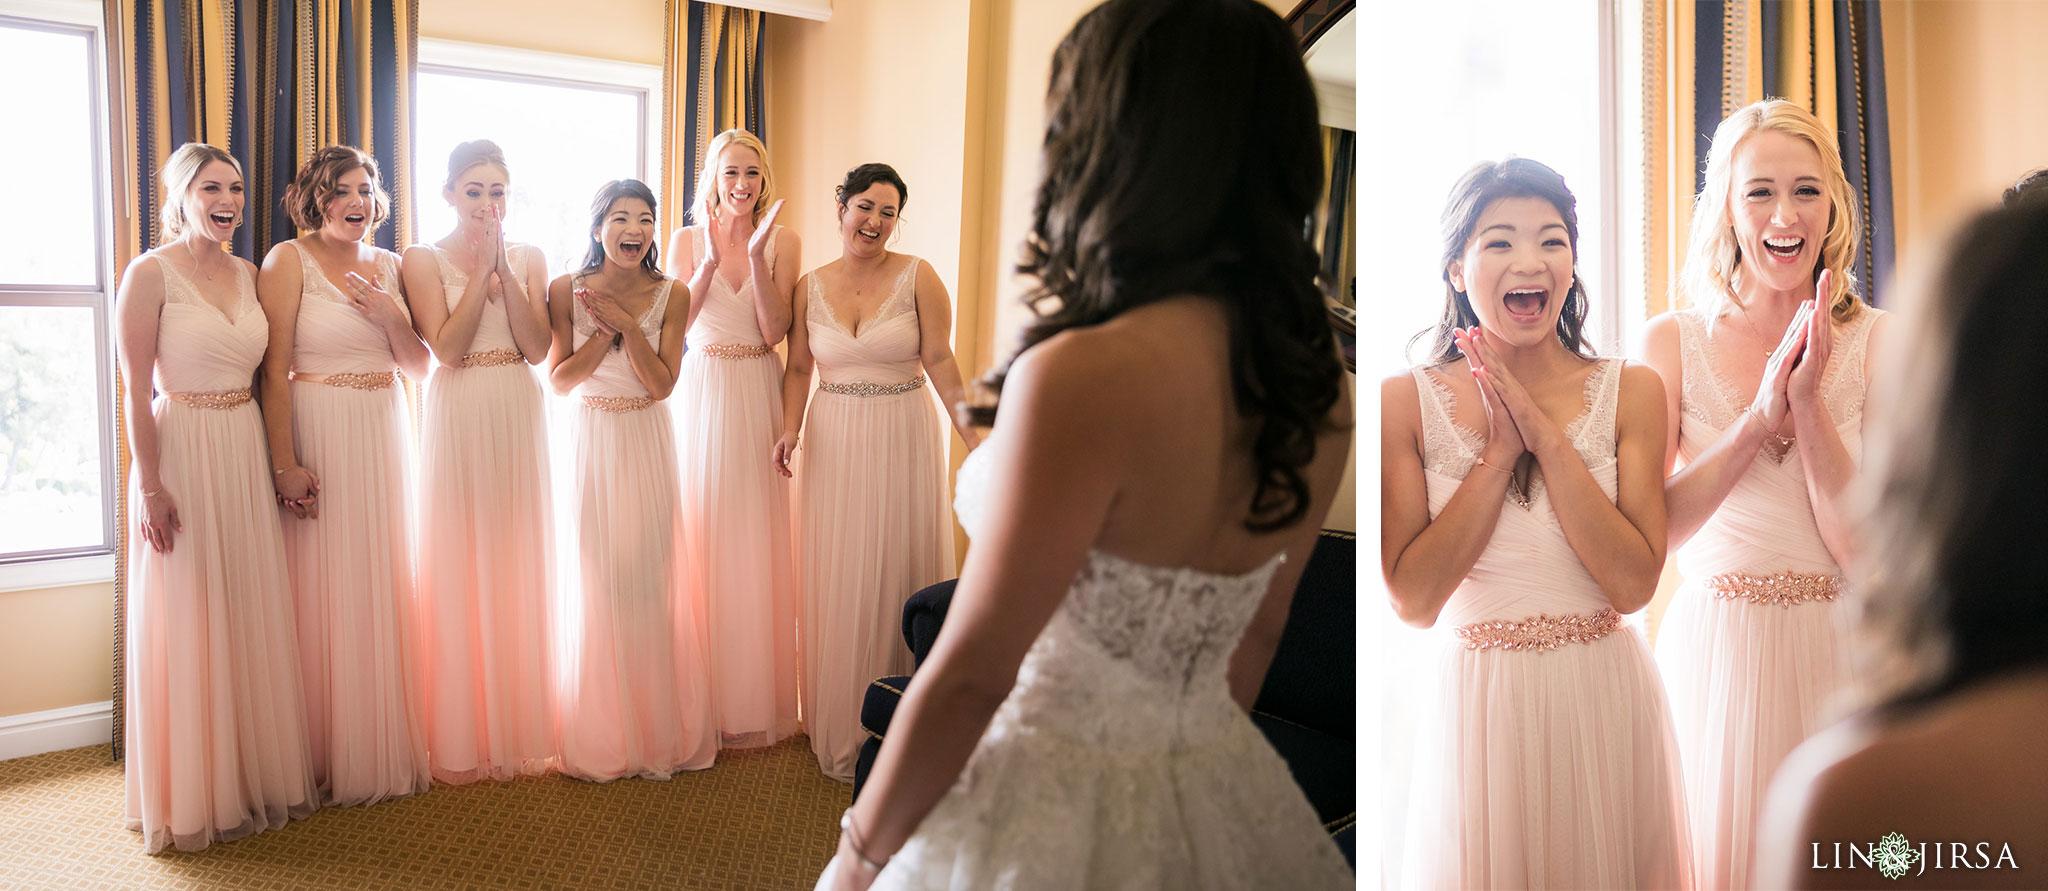 08 langham huntington pasadena bride wedding photography